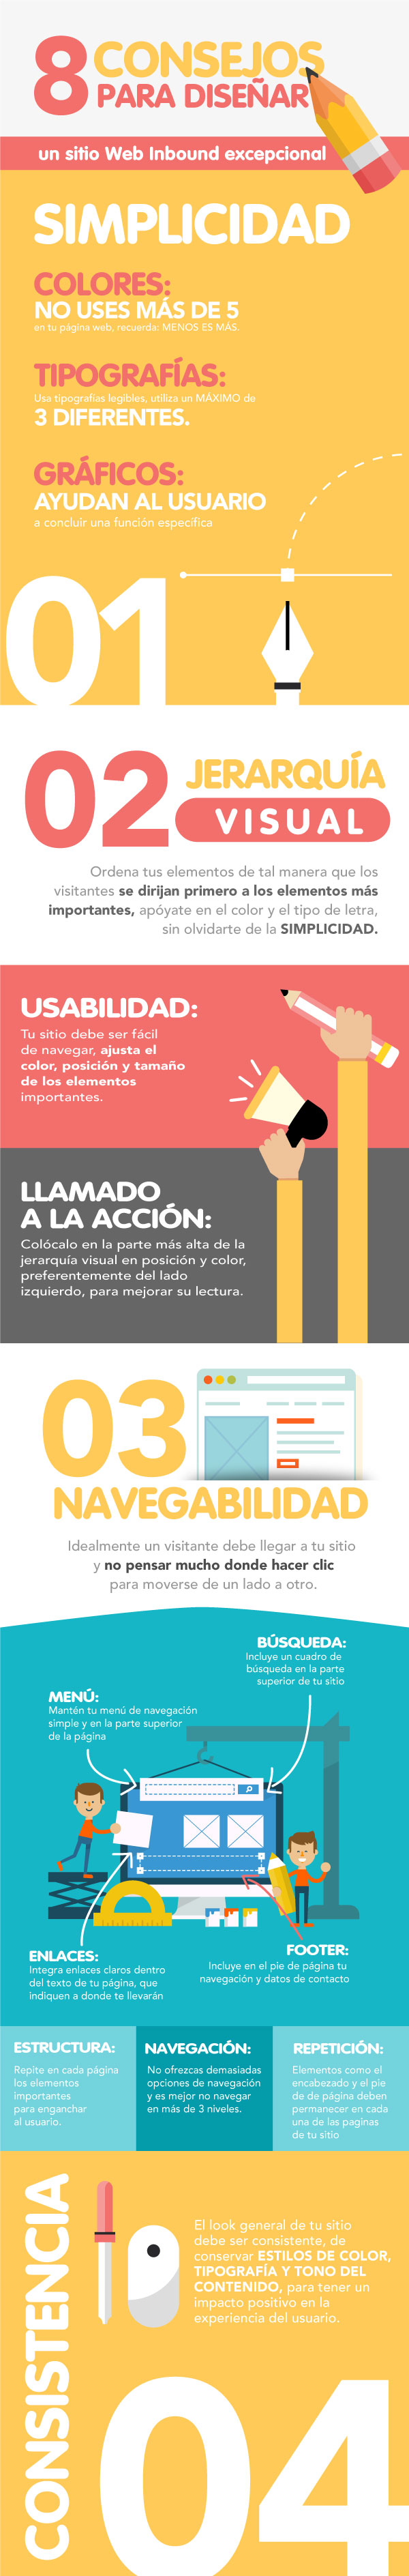 infografia_8consejos_1.jpg?width=650&upscale&j